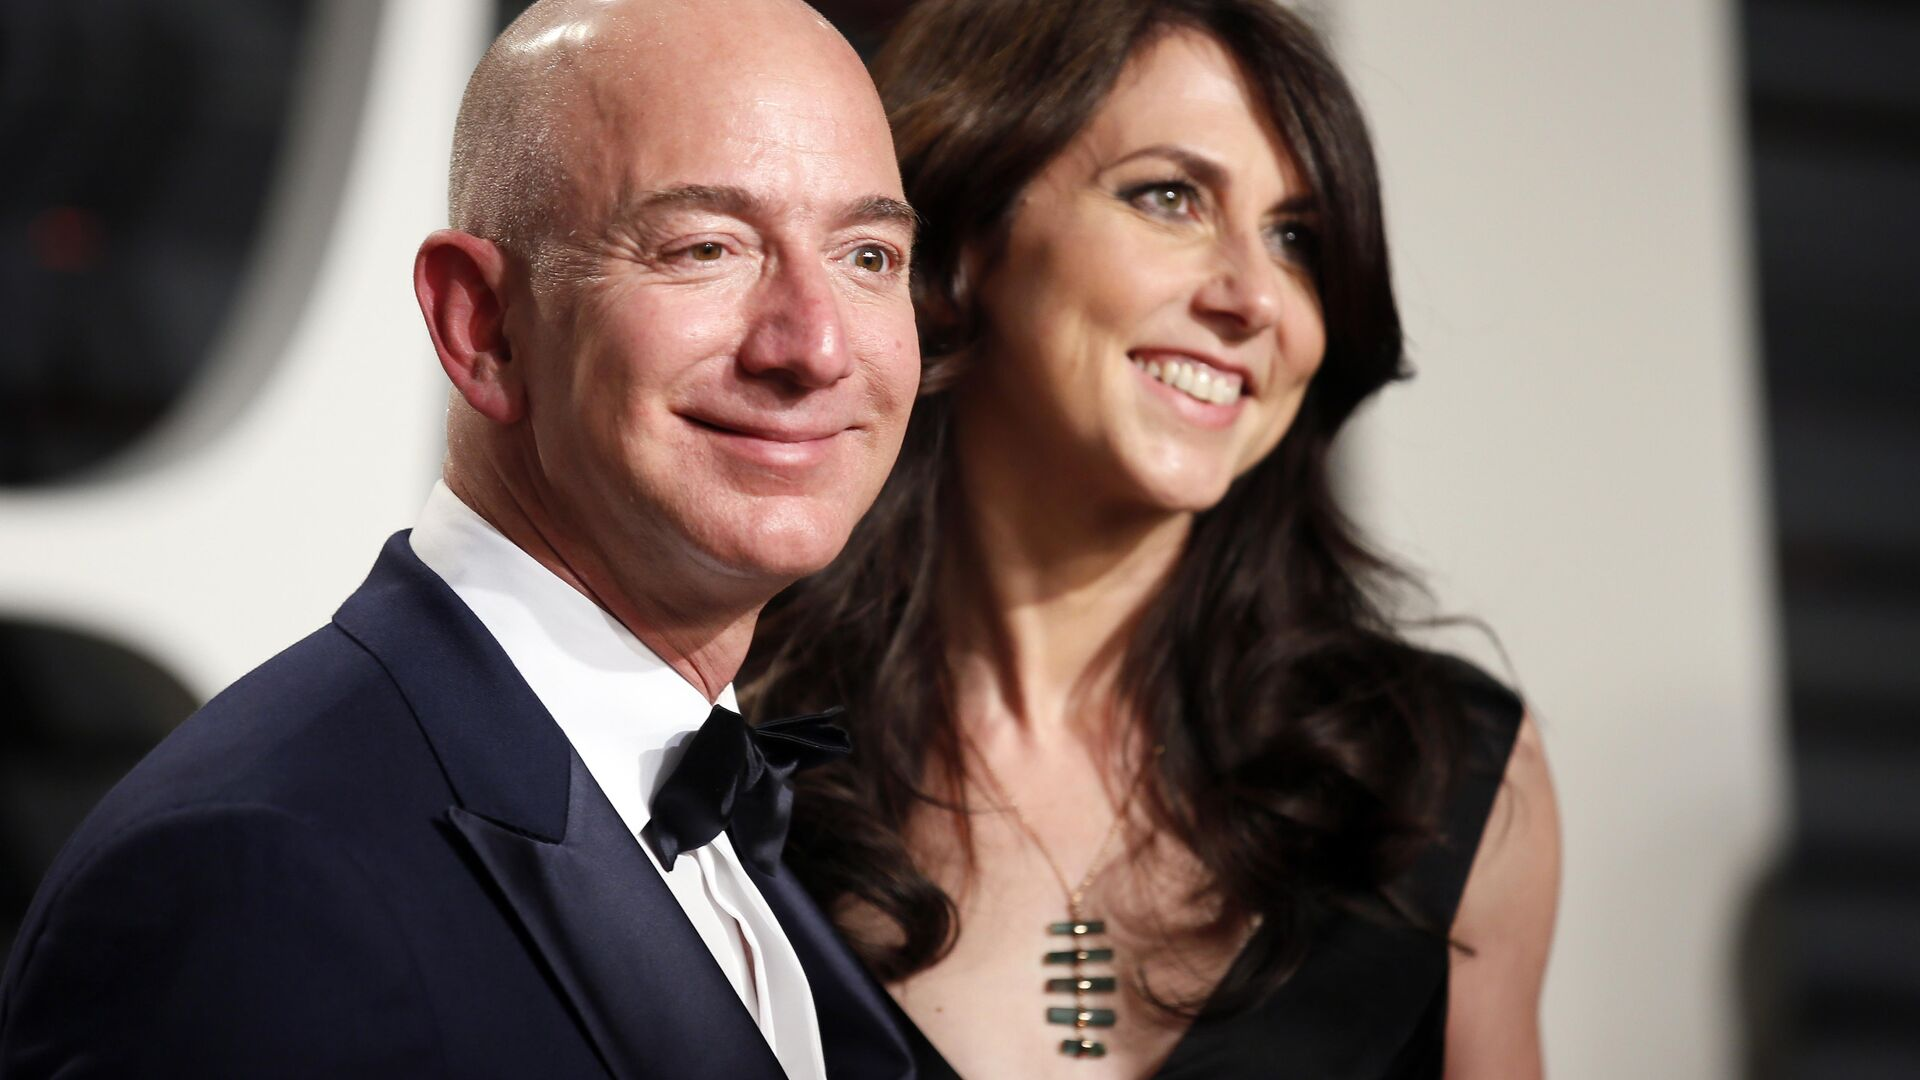 Jeff Bezos di Amazon e sua moglie MacKenzie Bezos. - Sputnik Italia, 1920, 16.06.2021